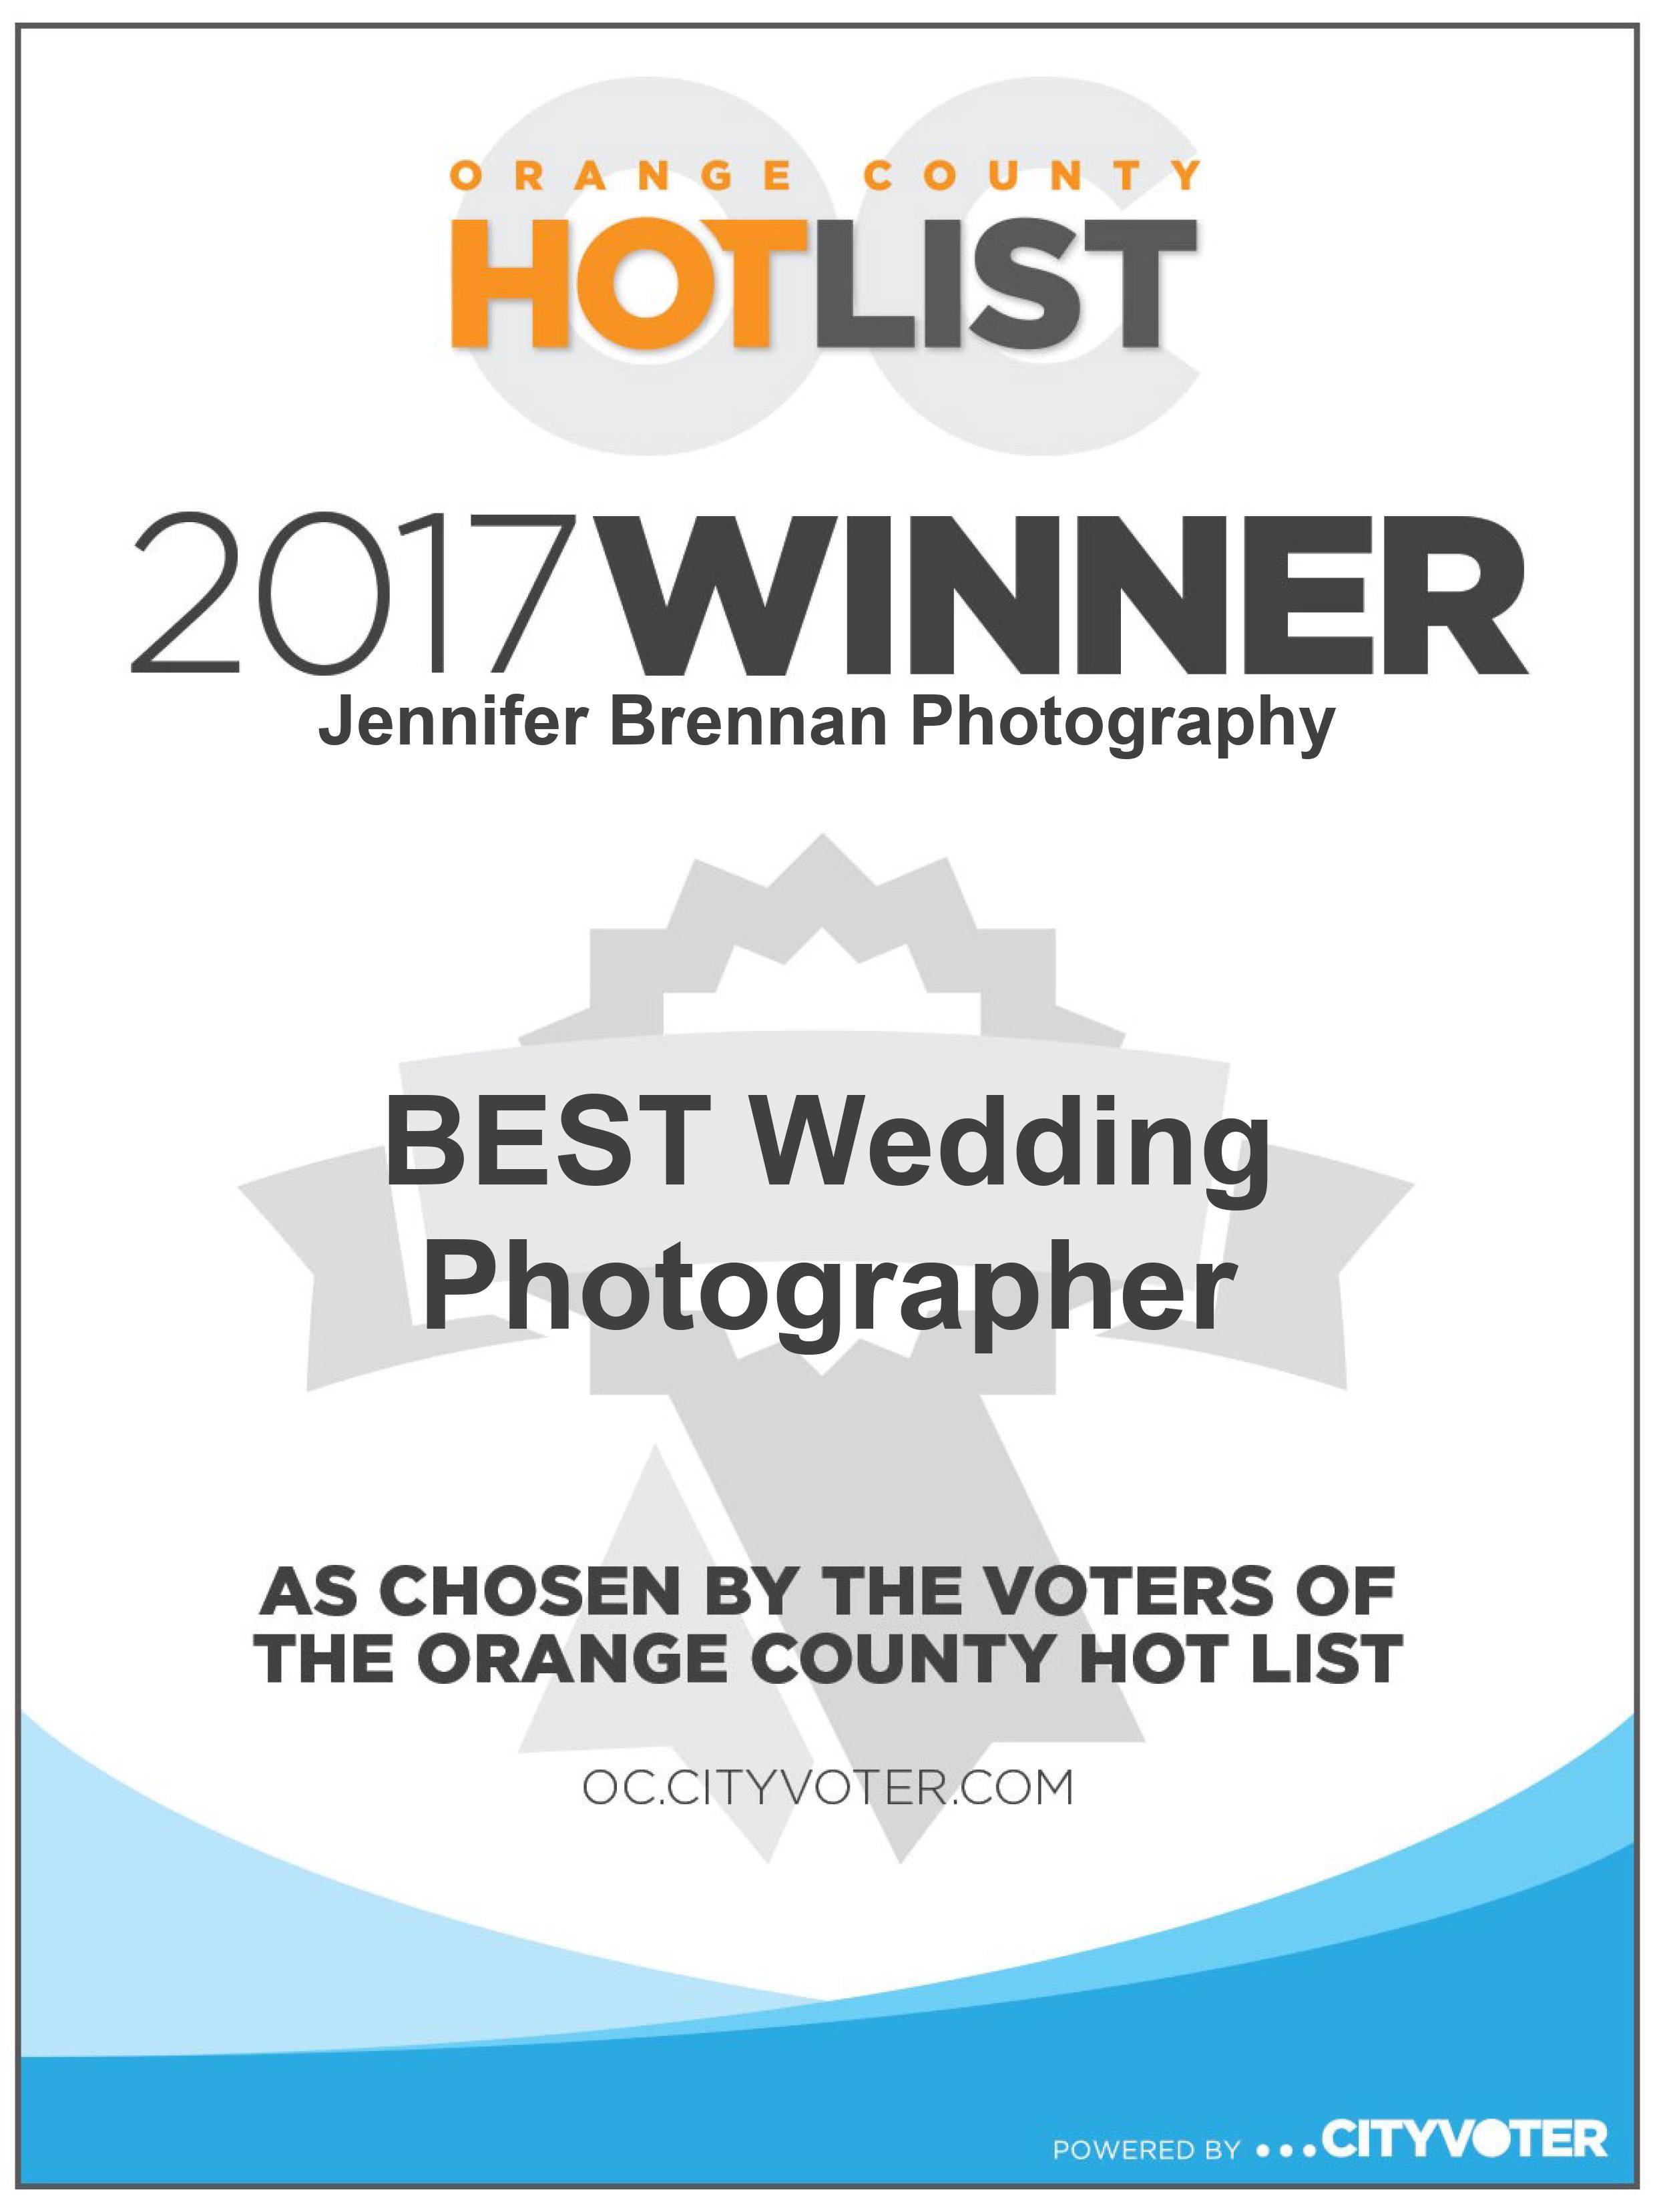 jennifer-brennan-photography-winners-certificate-2.jpg